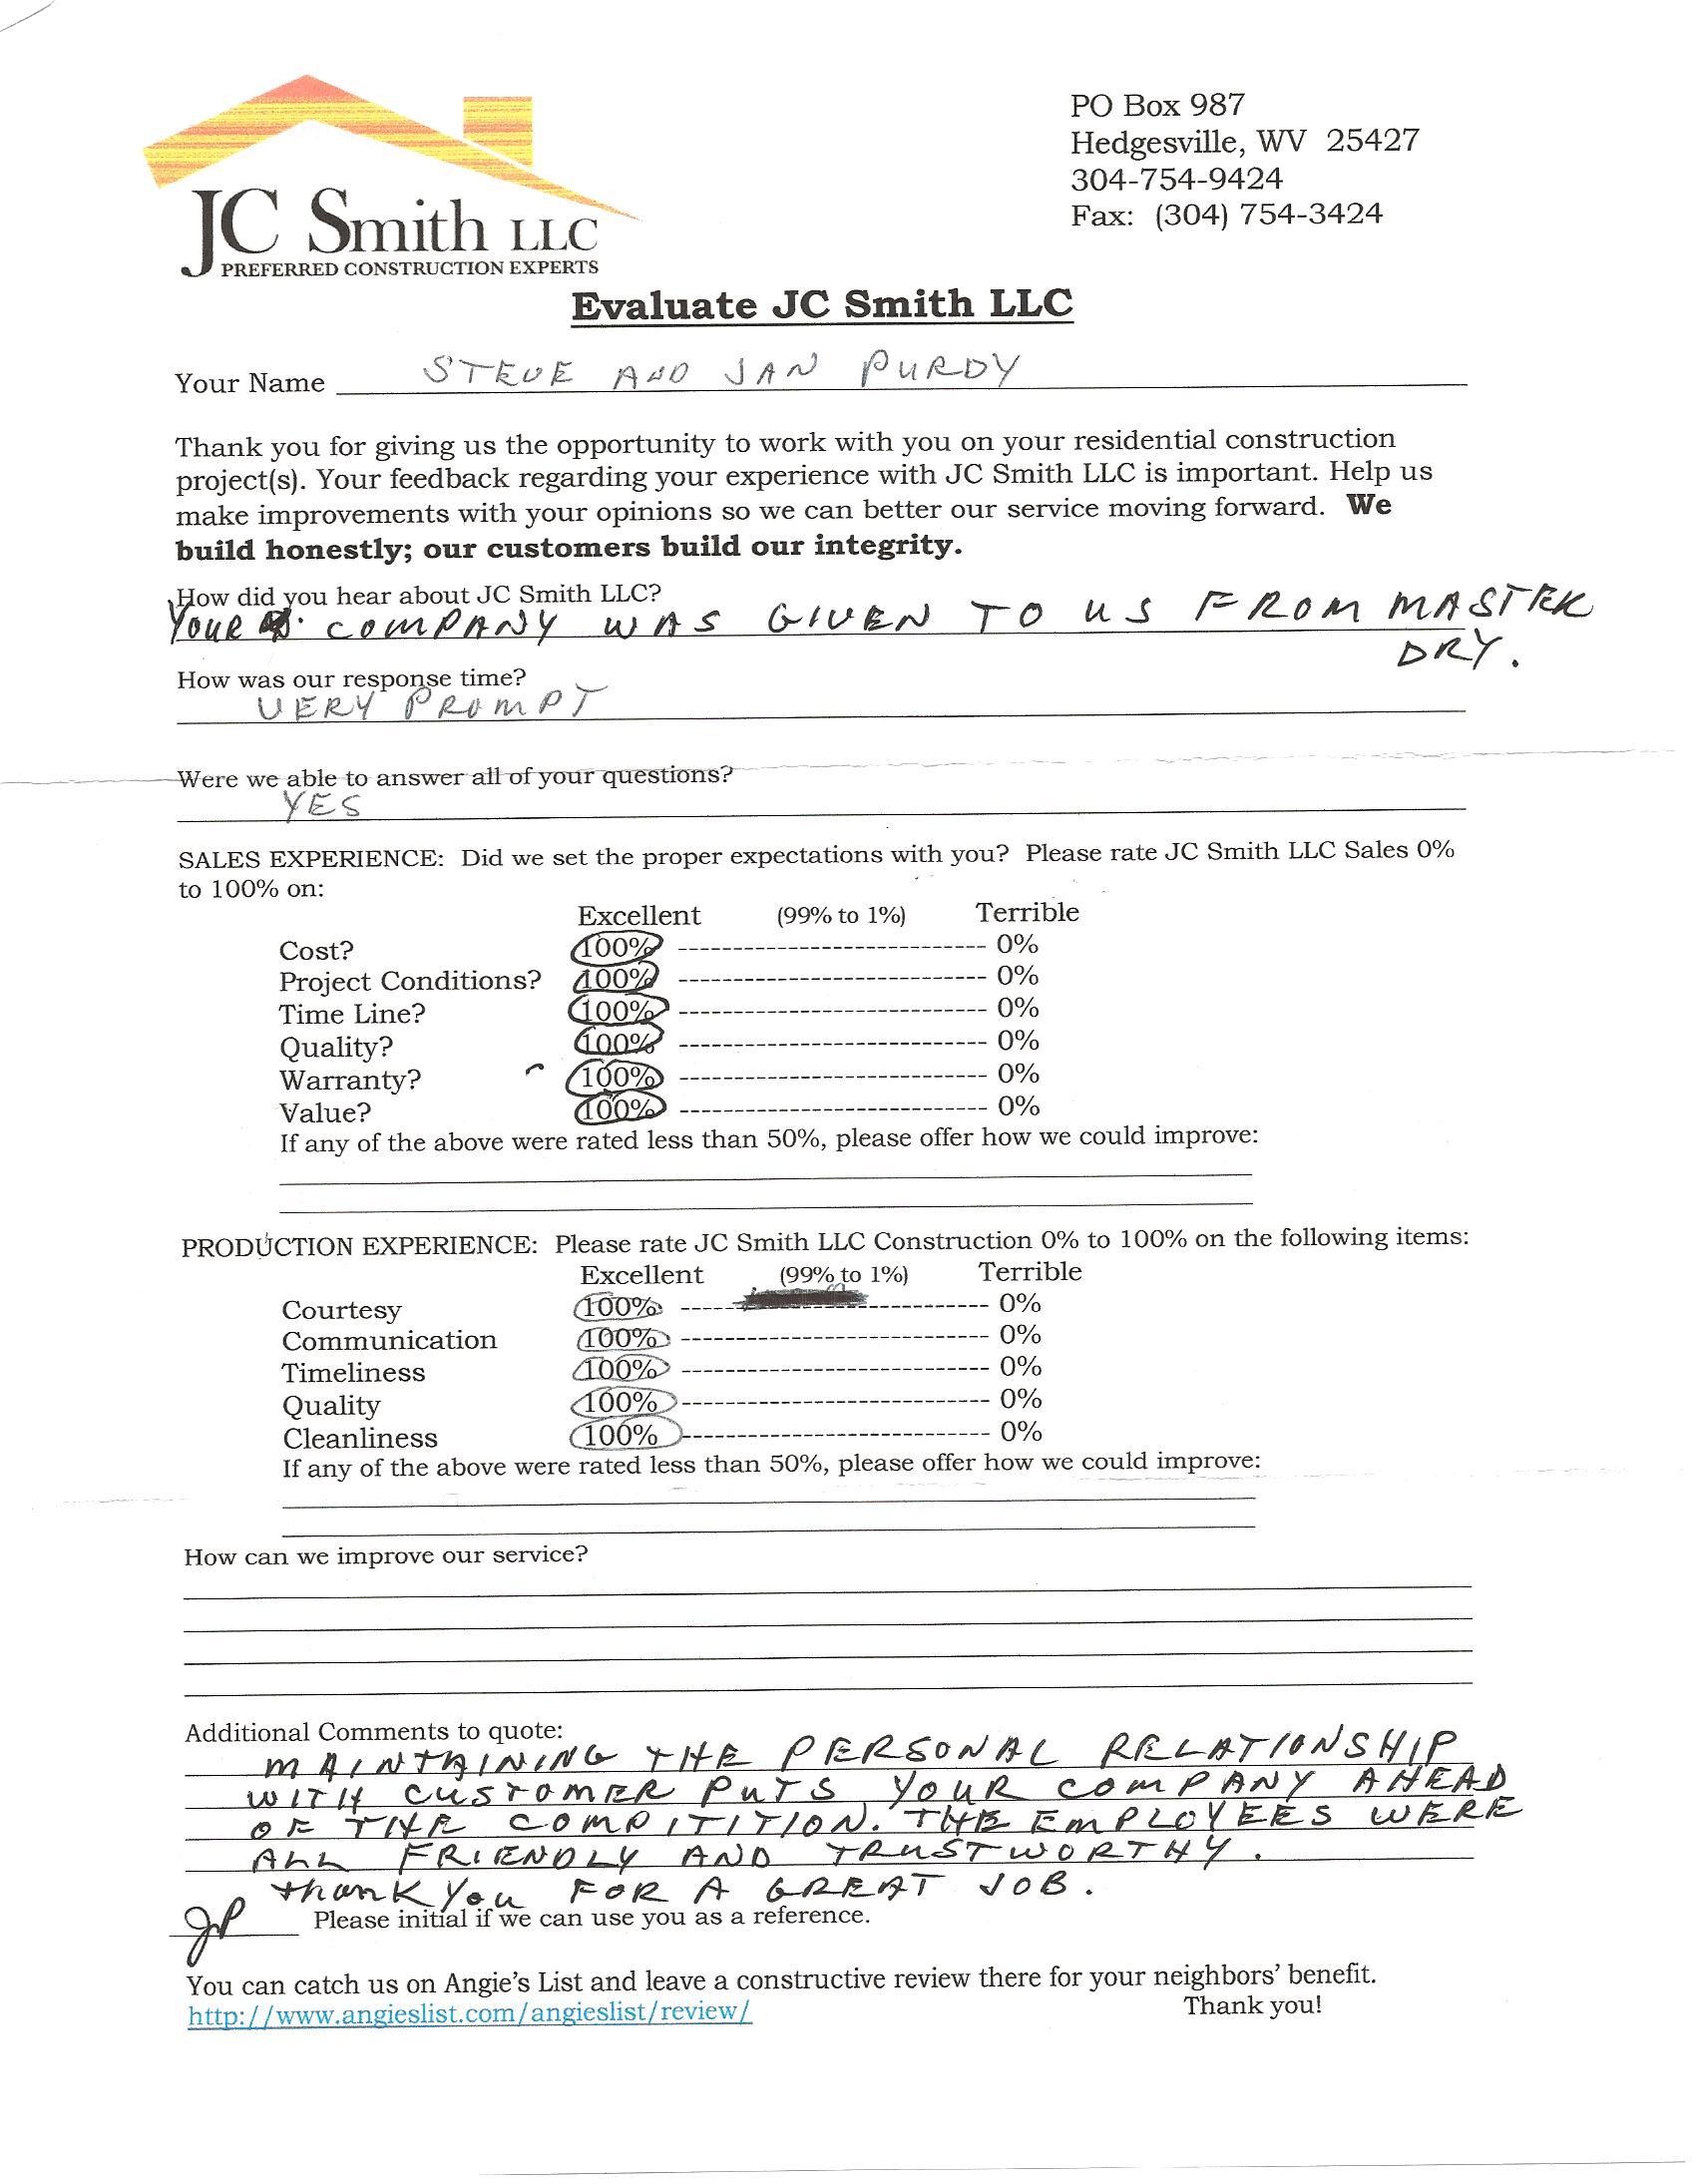 JC Smith Evaluation 26